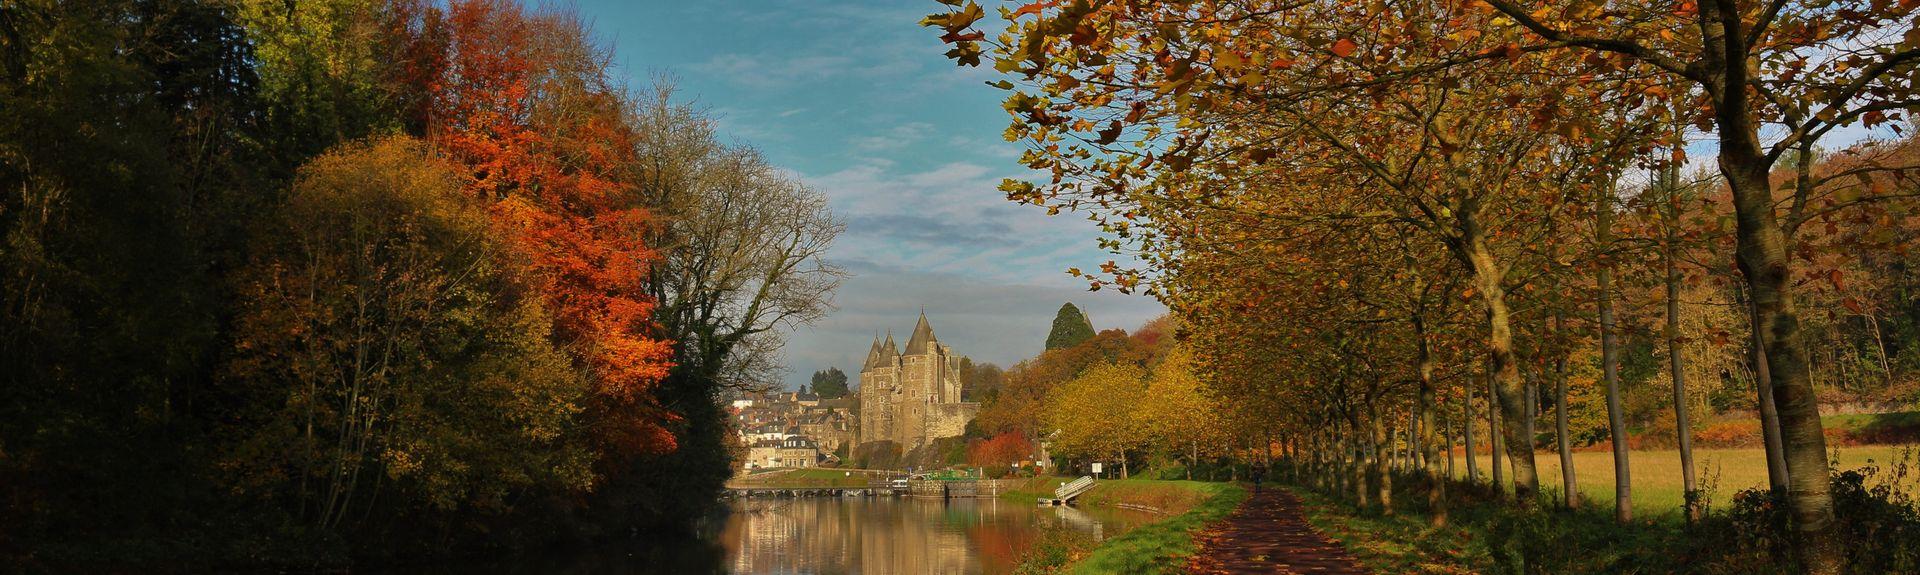 Neant-sur-Yvel, Morbihan, France